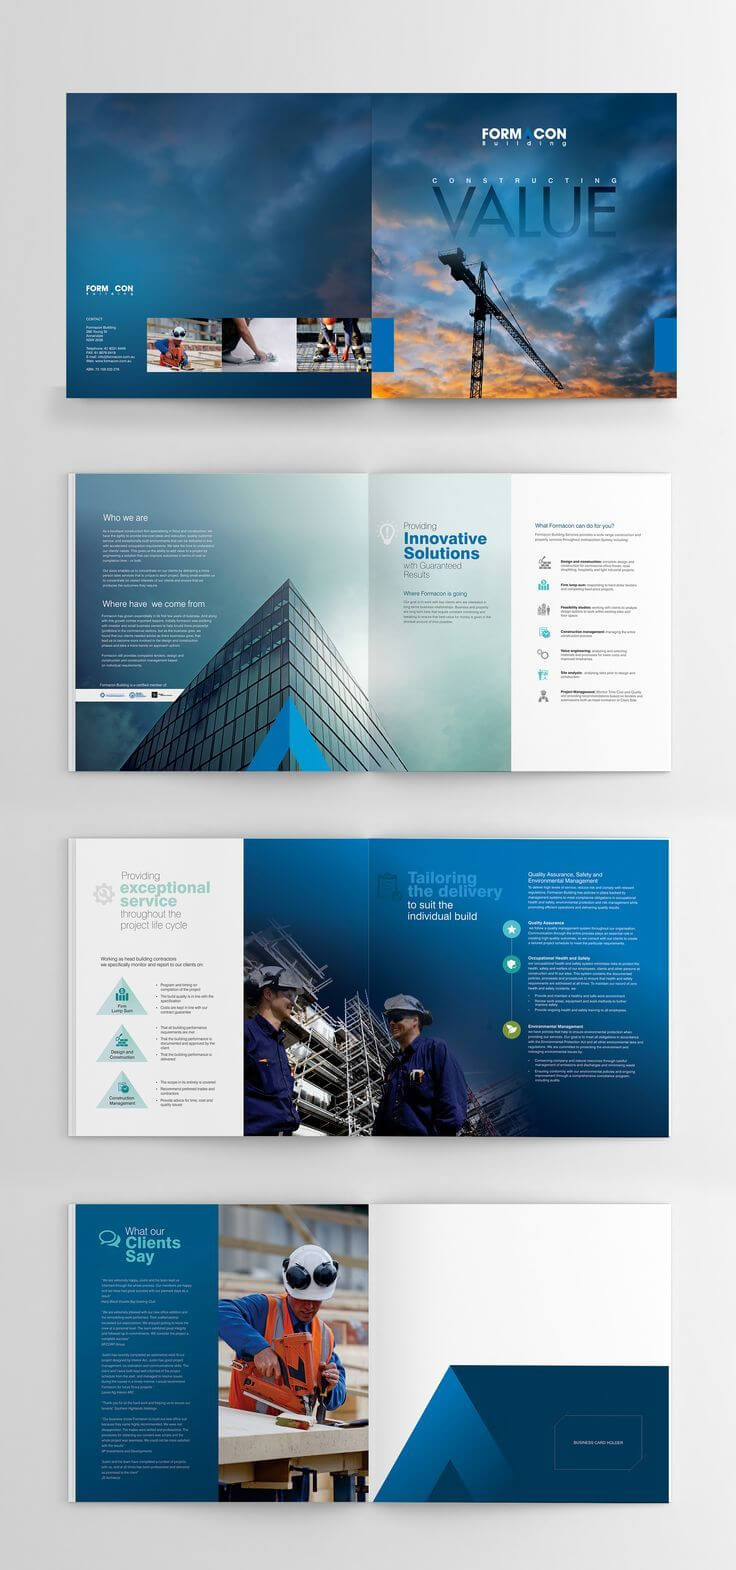 100+ Free Brochure Templates, Design & Print Brochures Pertaining To Online Free Brochure Design Templates